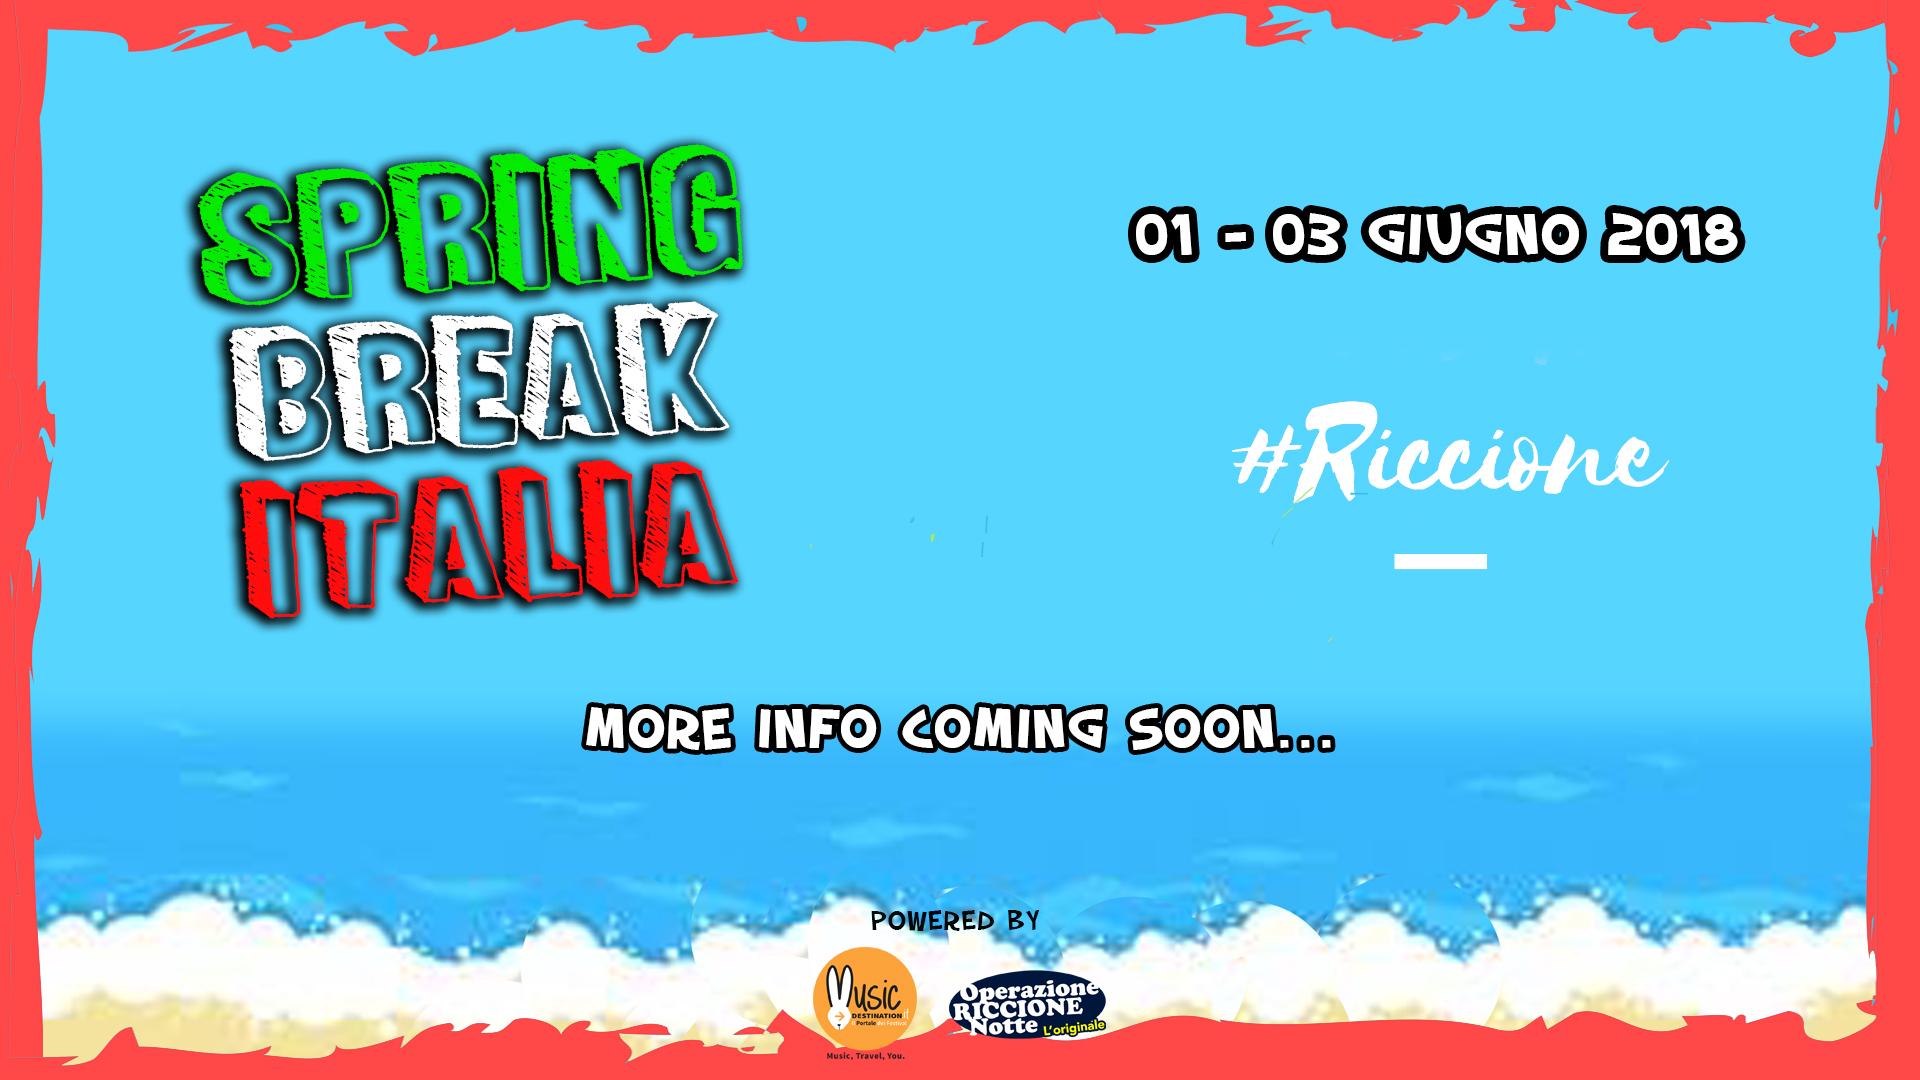 Spring Break Italia